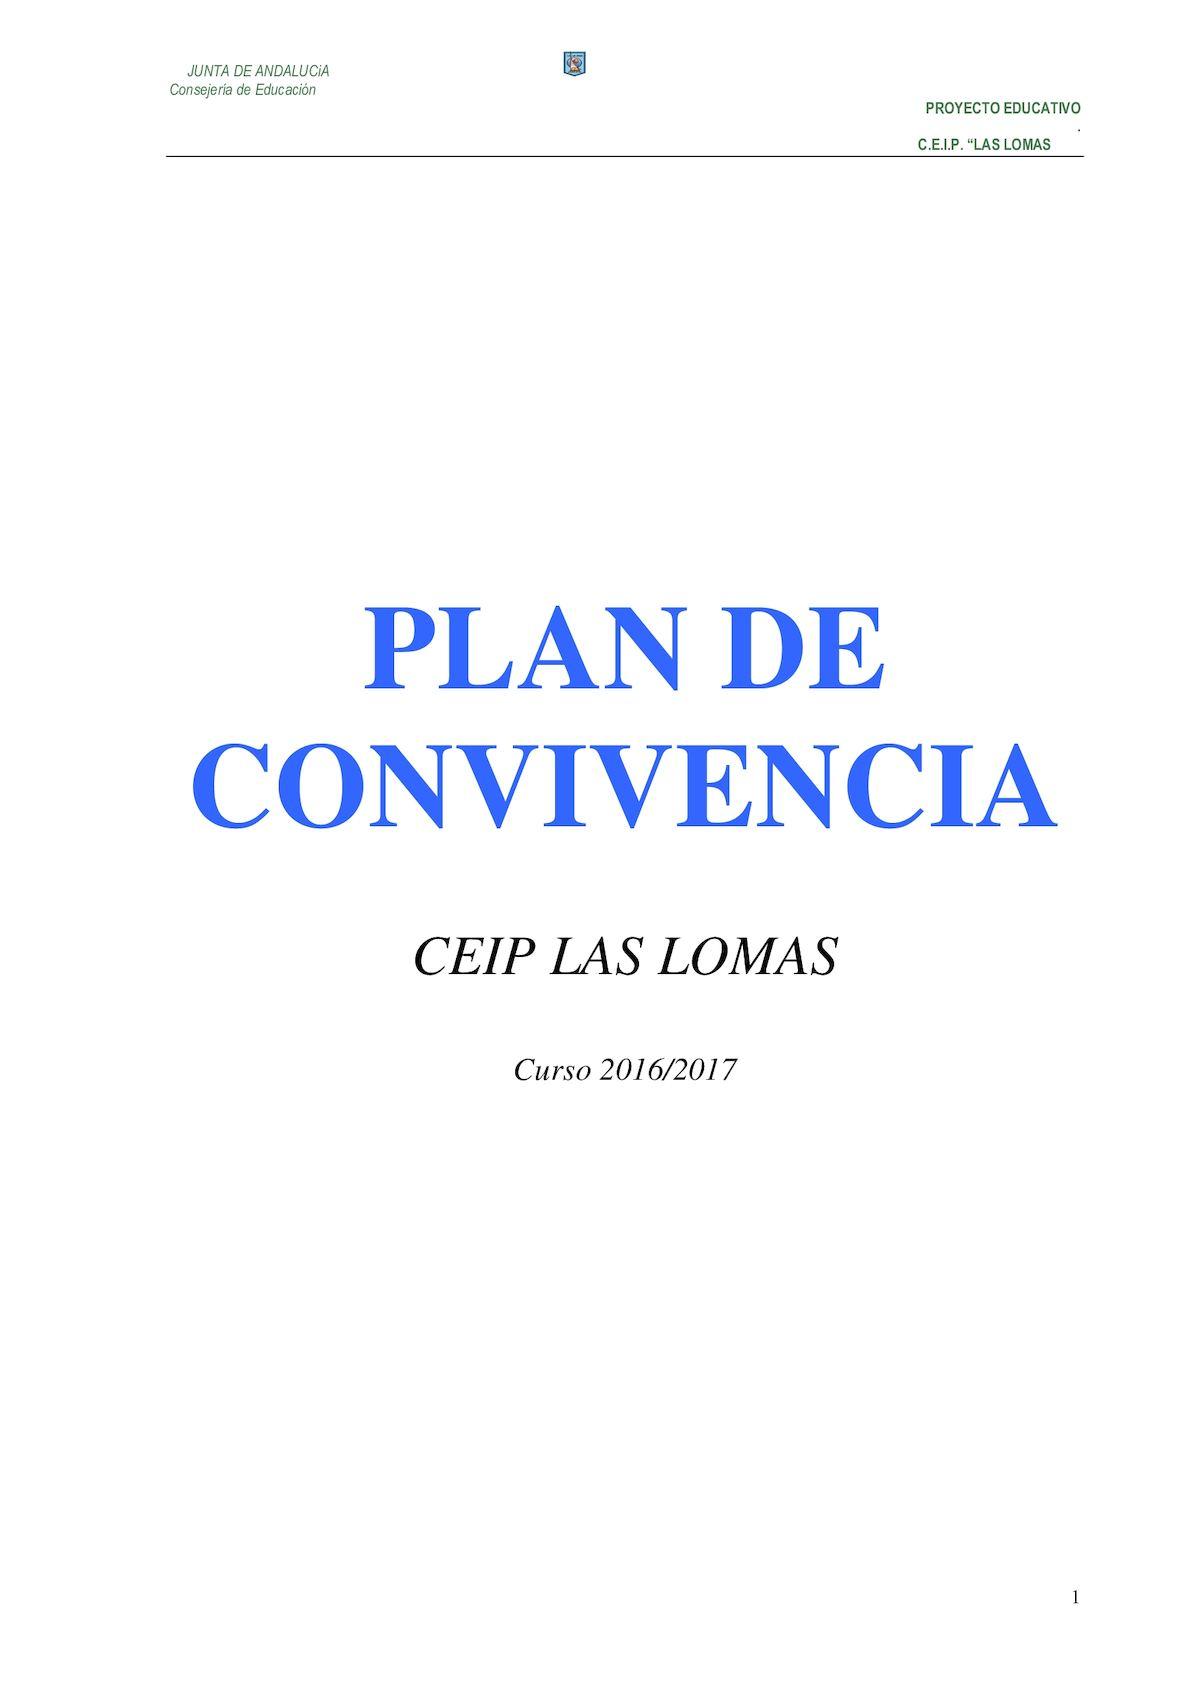 Calaméo - Plan De Convivencia CEIP Las Lomas 2016 2017